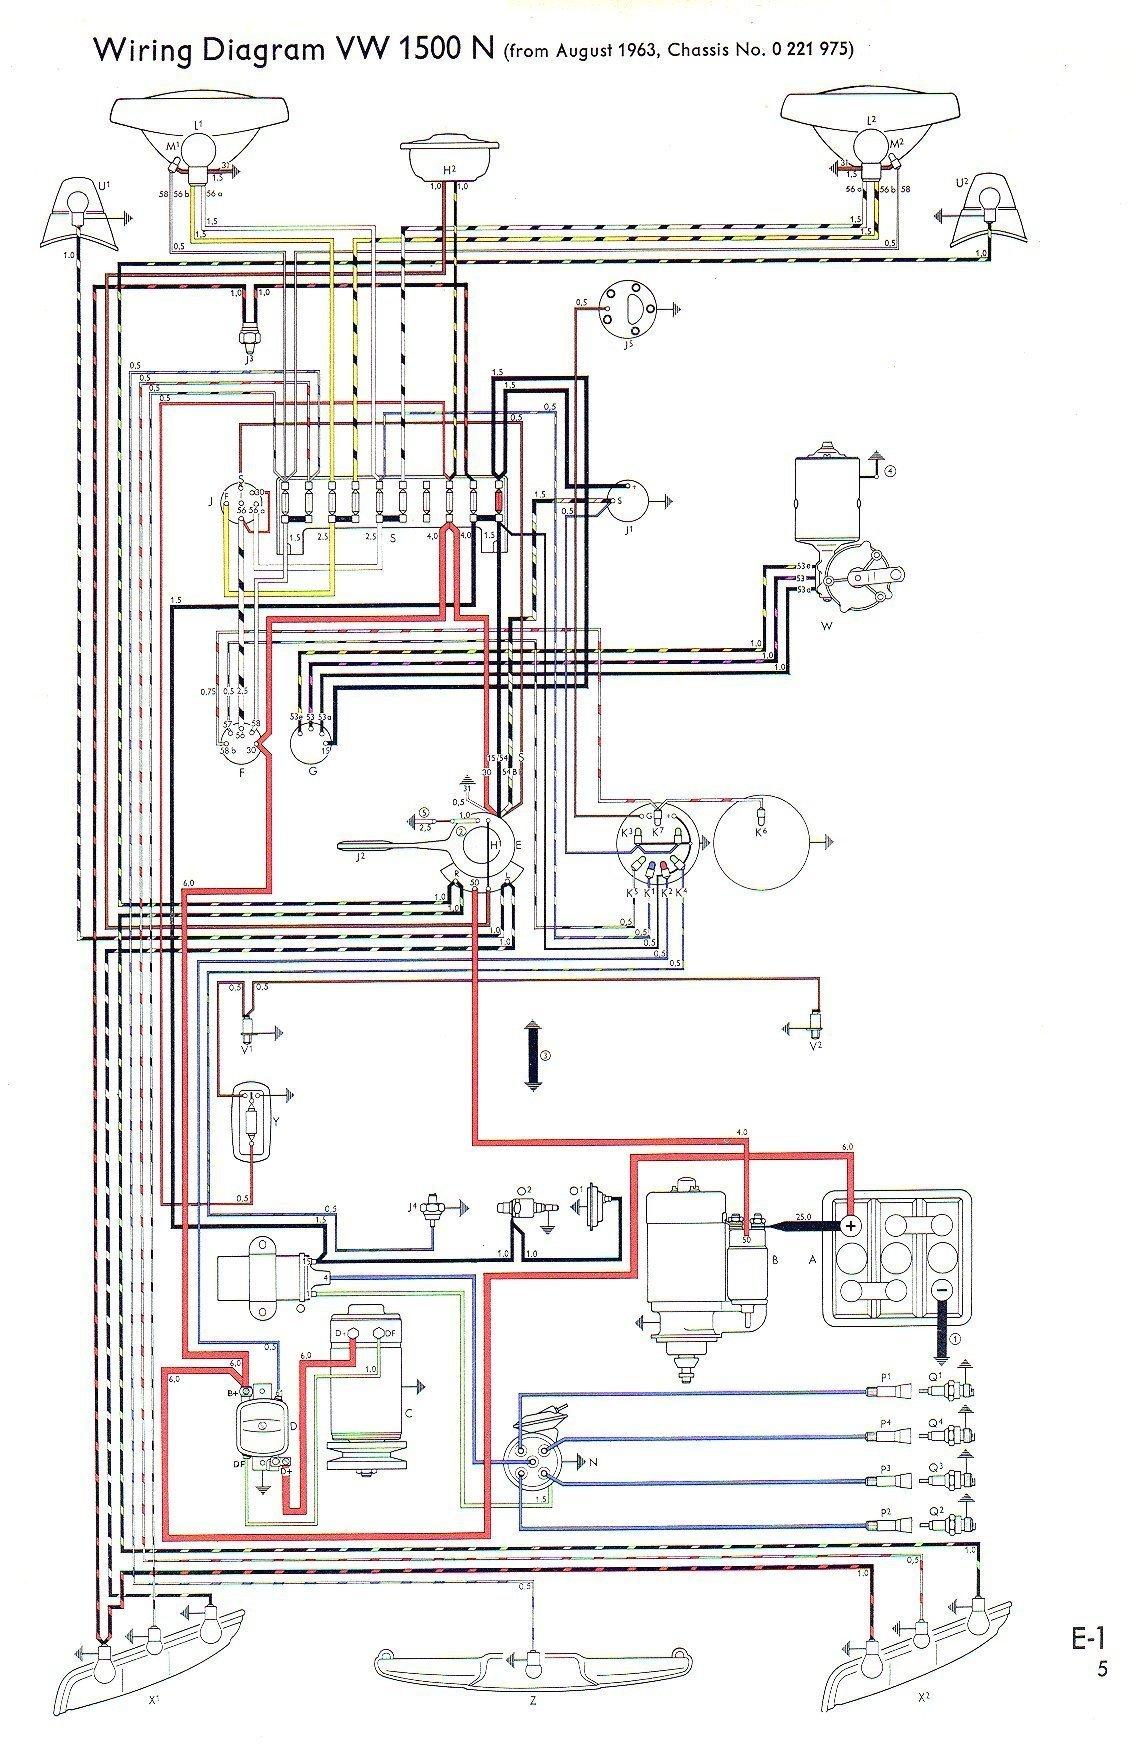 VW Type 3 Wiring DiagramsThe VW Type 3 & 4 Club